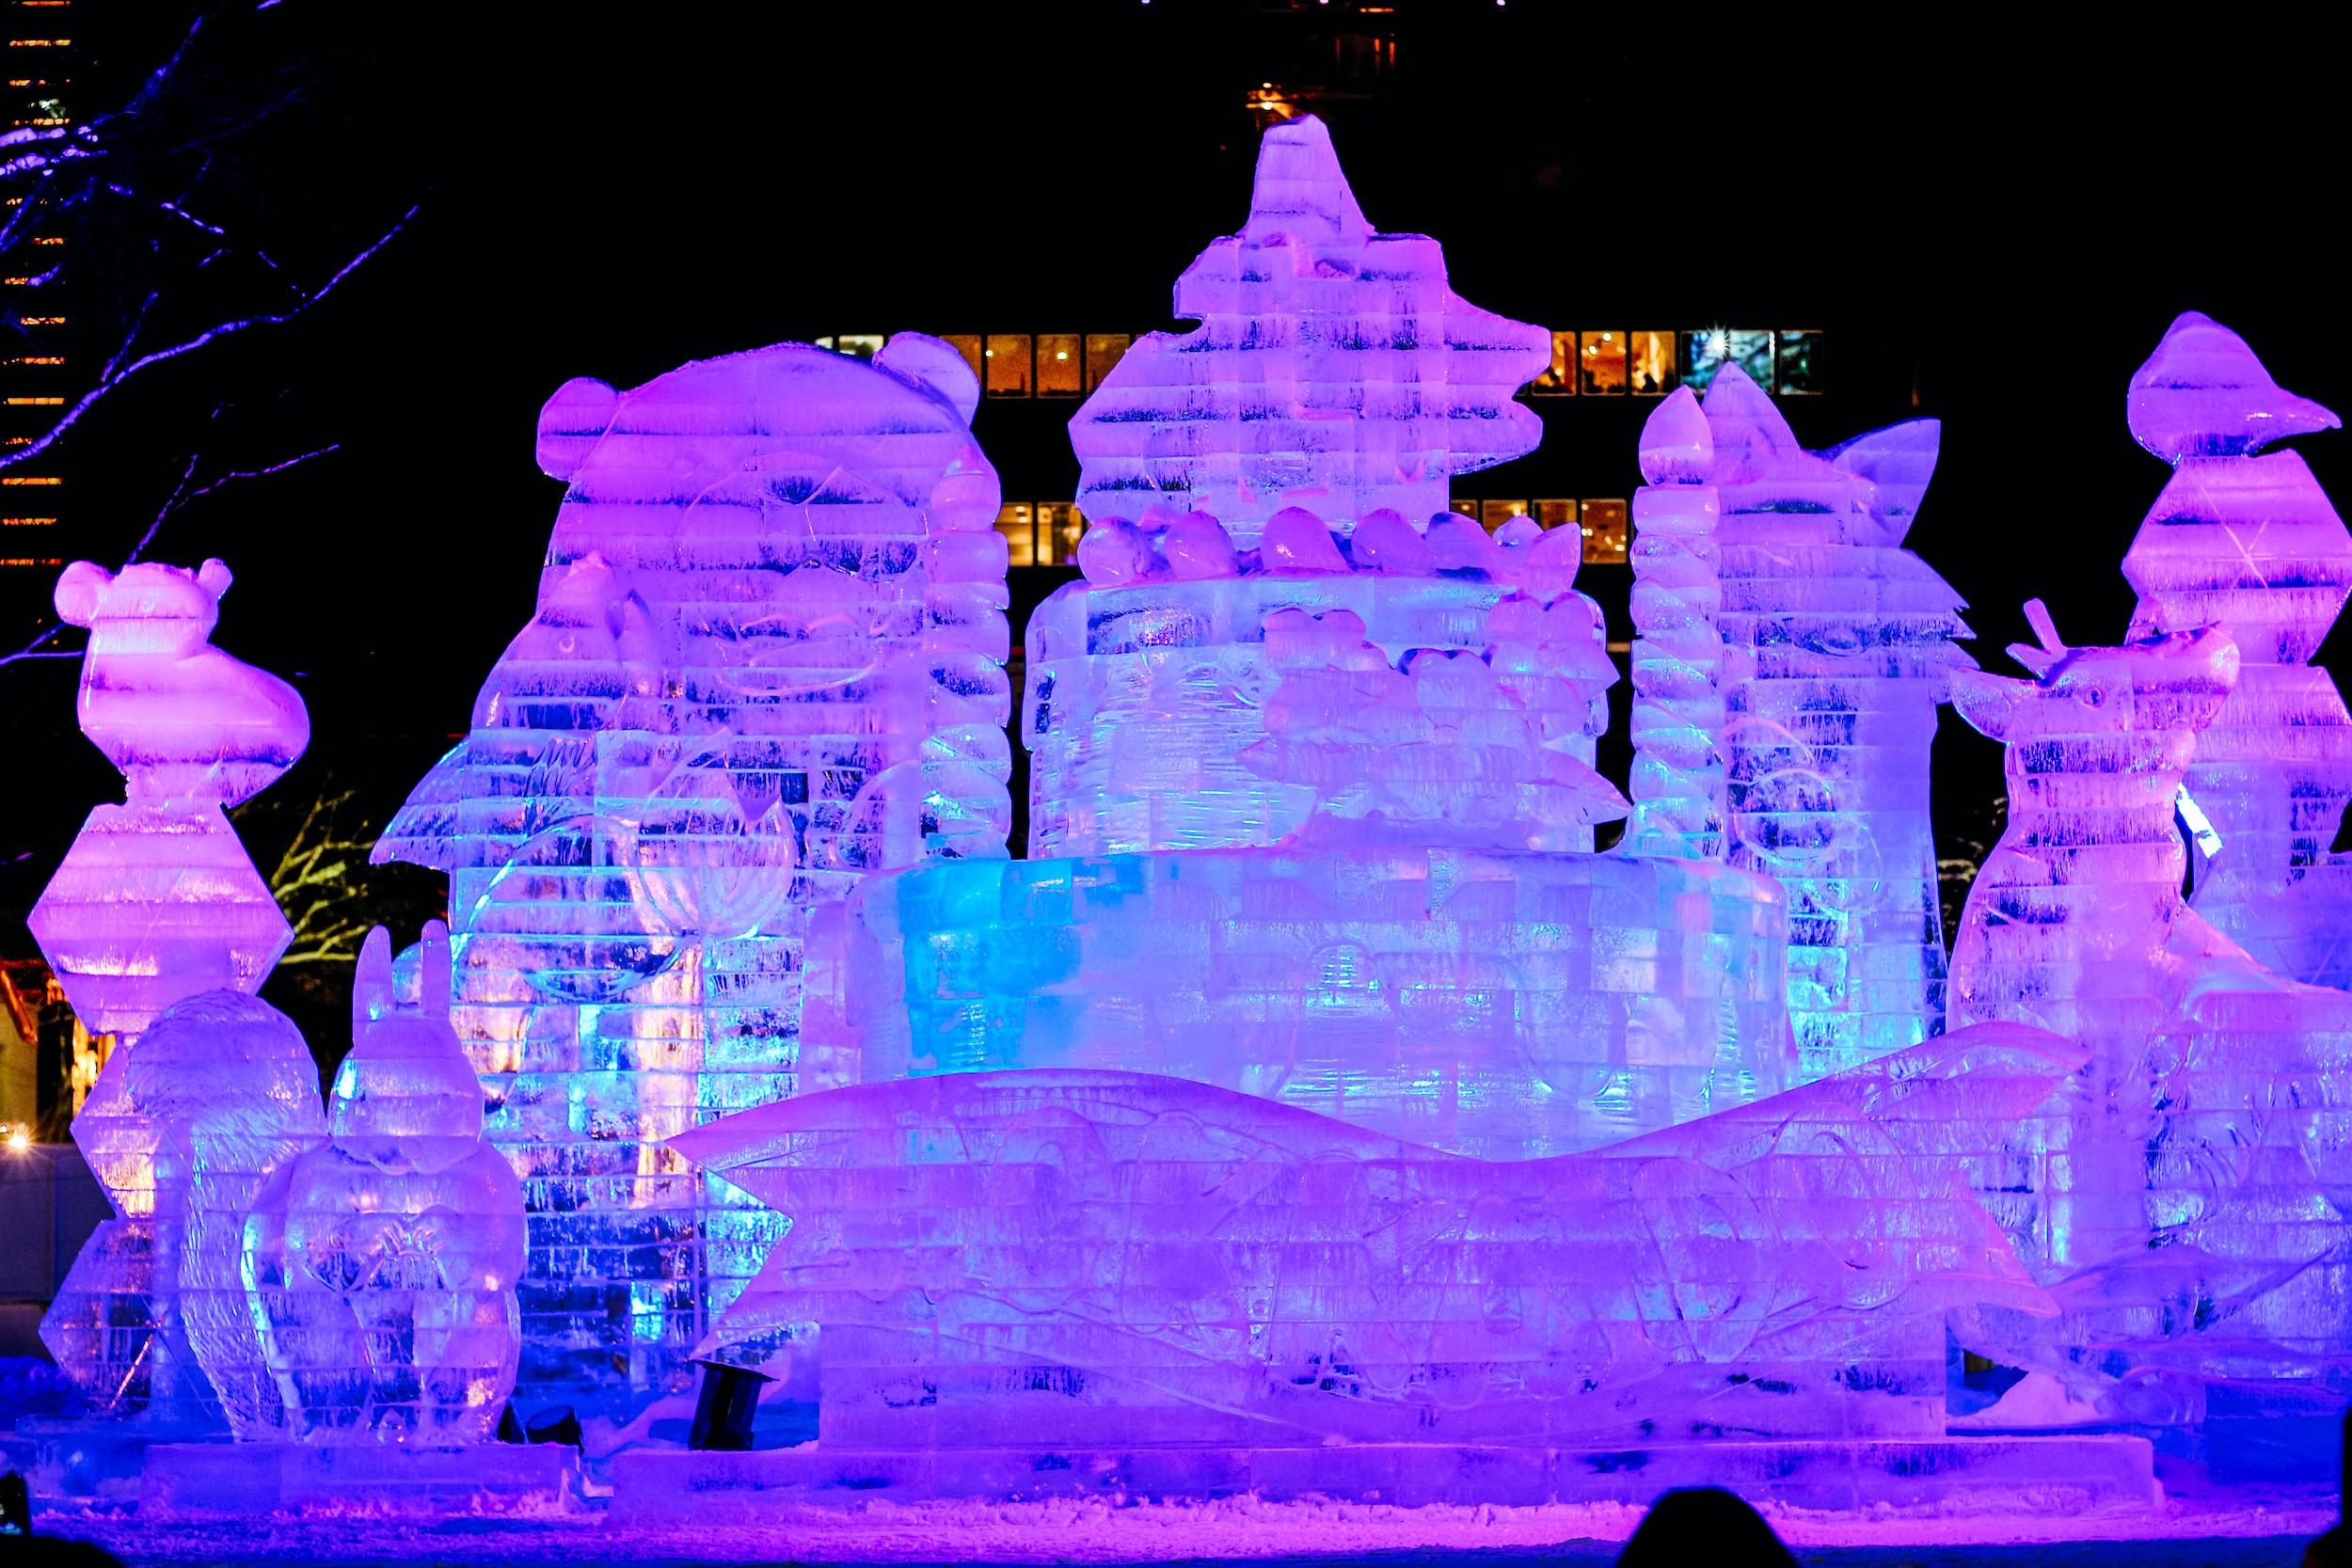 Festival neige Sapporo Japon 2